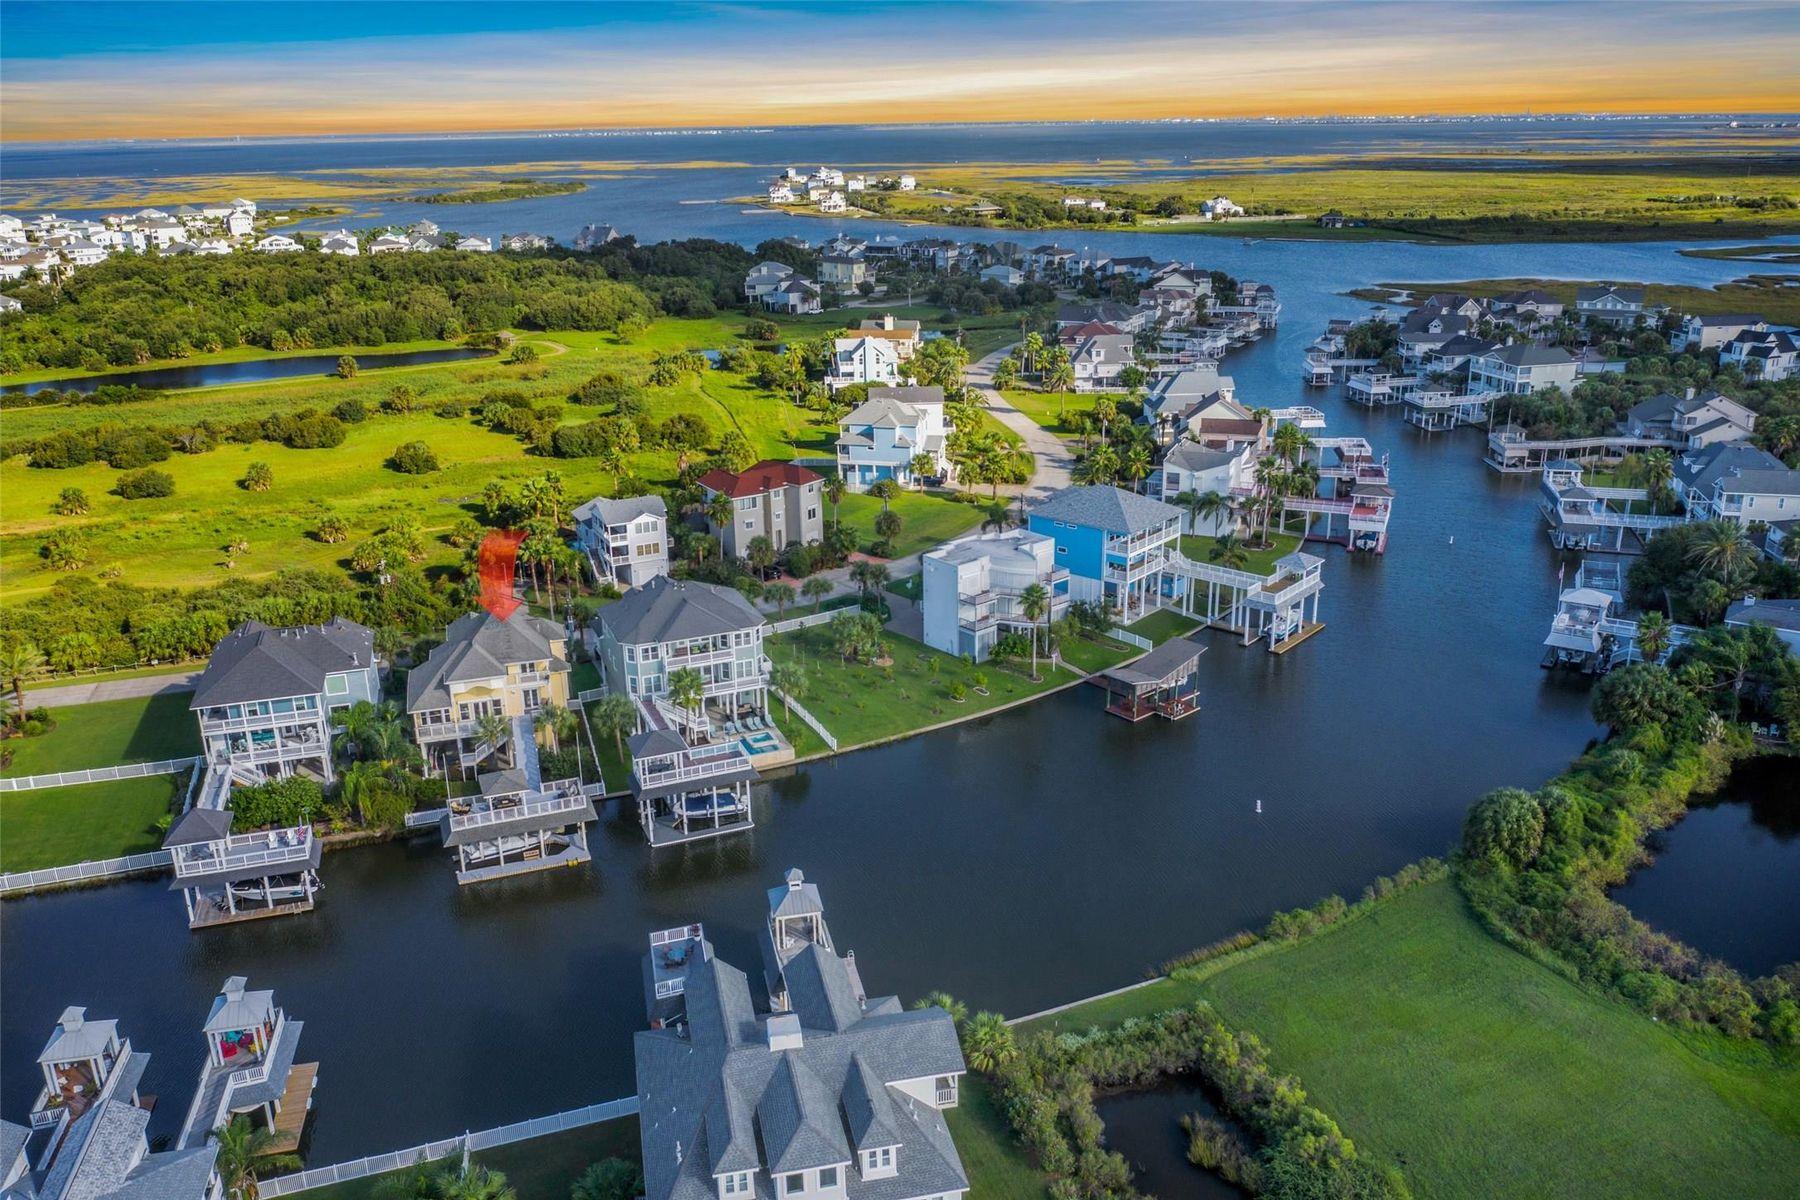 Single Family Homes for Sale at 13427 Binnacle Way Galveston, Texas 77554 United States